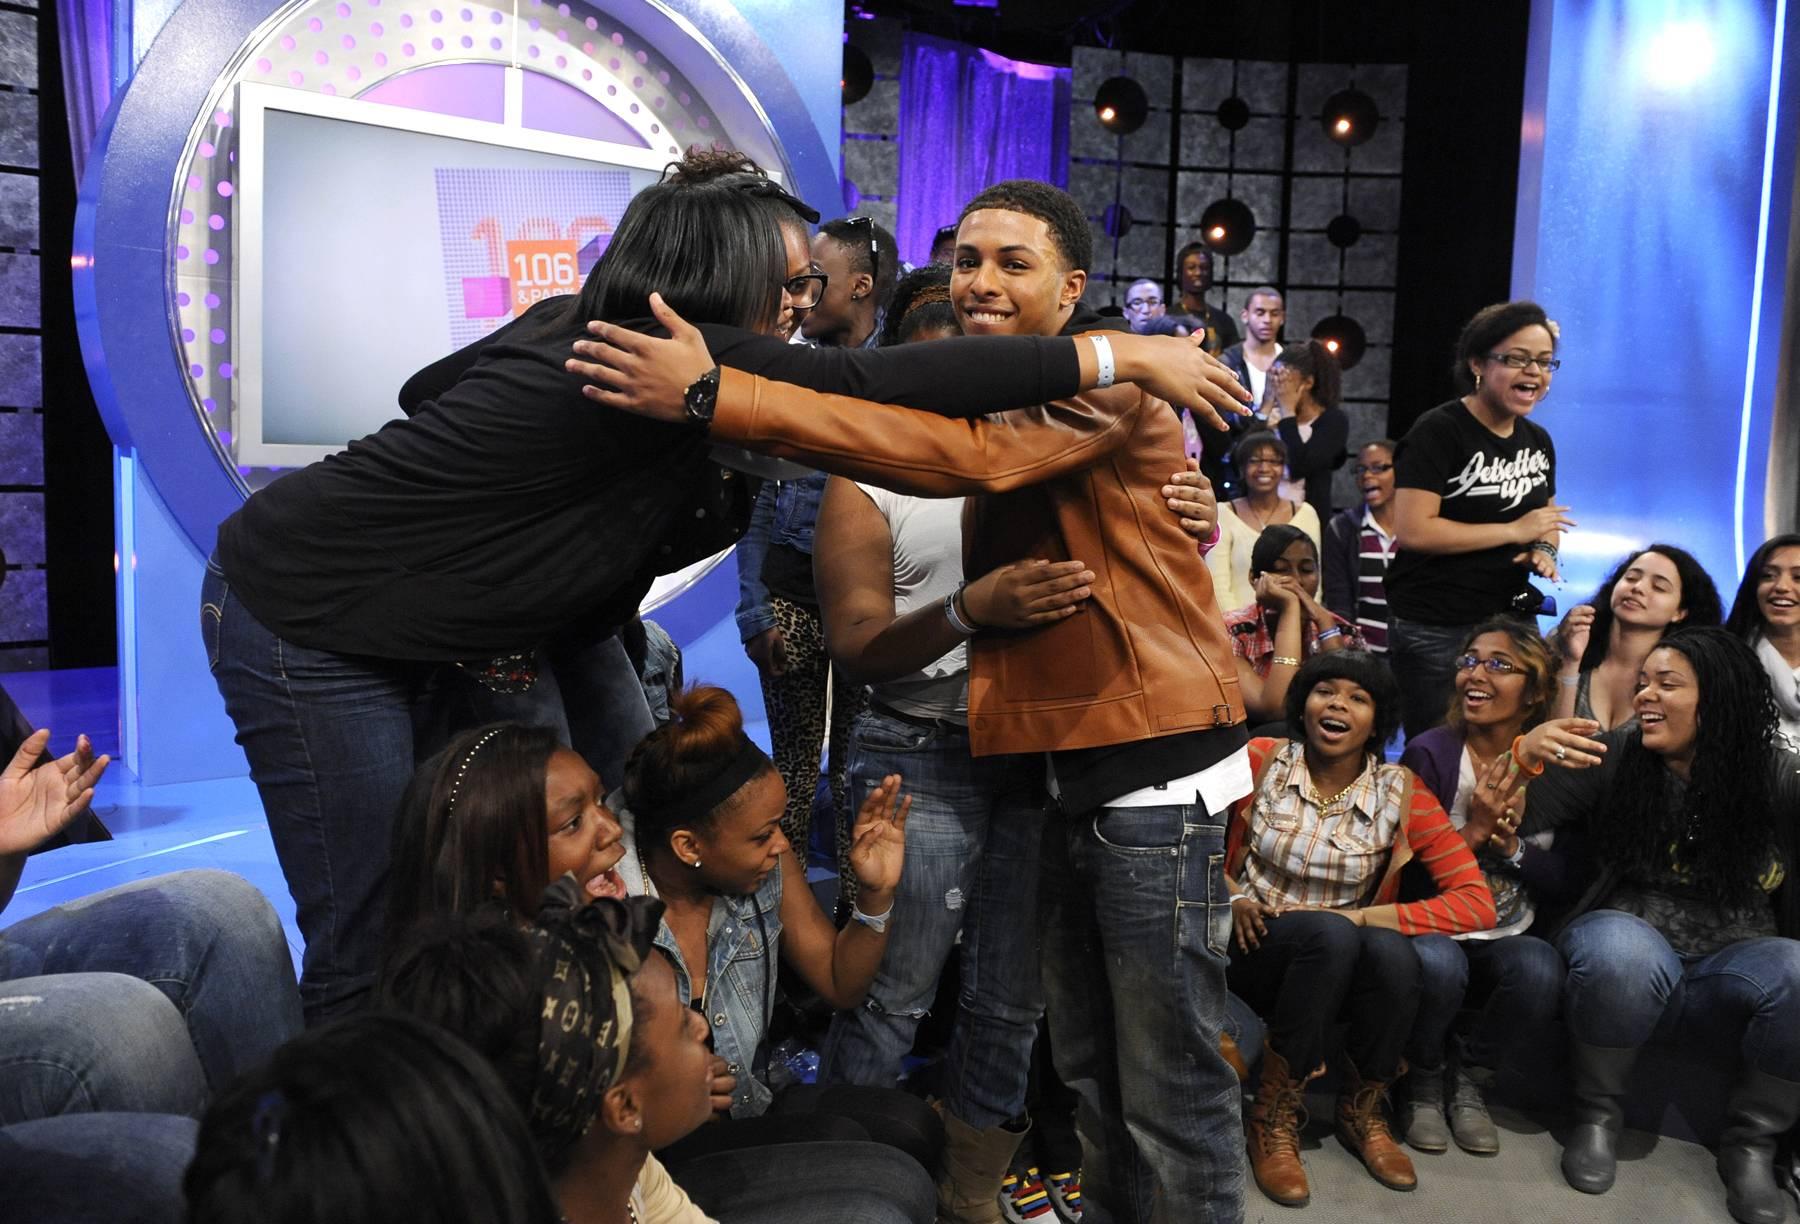 Spread the Love - Diggy Simmons at 106 & Park, May 22, 2012. (Photo: John Ricard / BET)